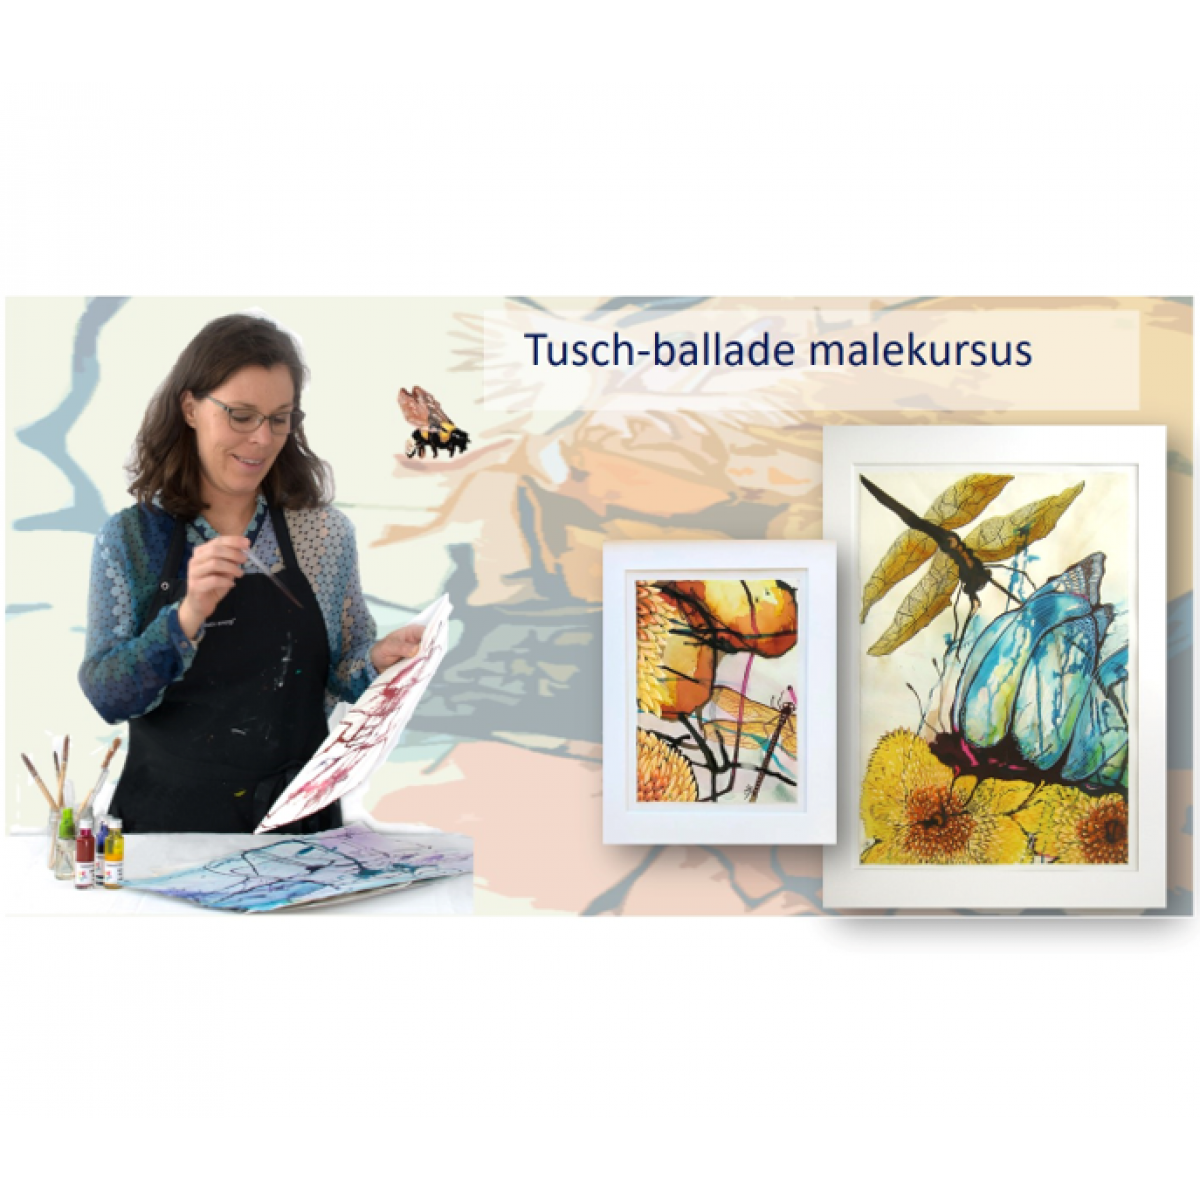 Christina Monrad, Tusch-ballade, 13. august